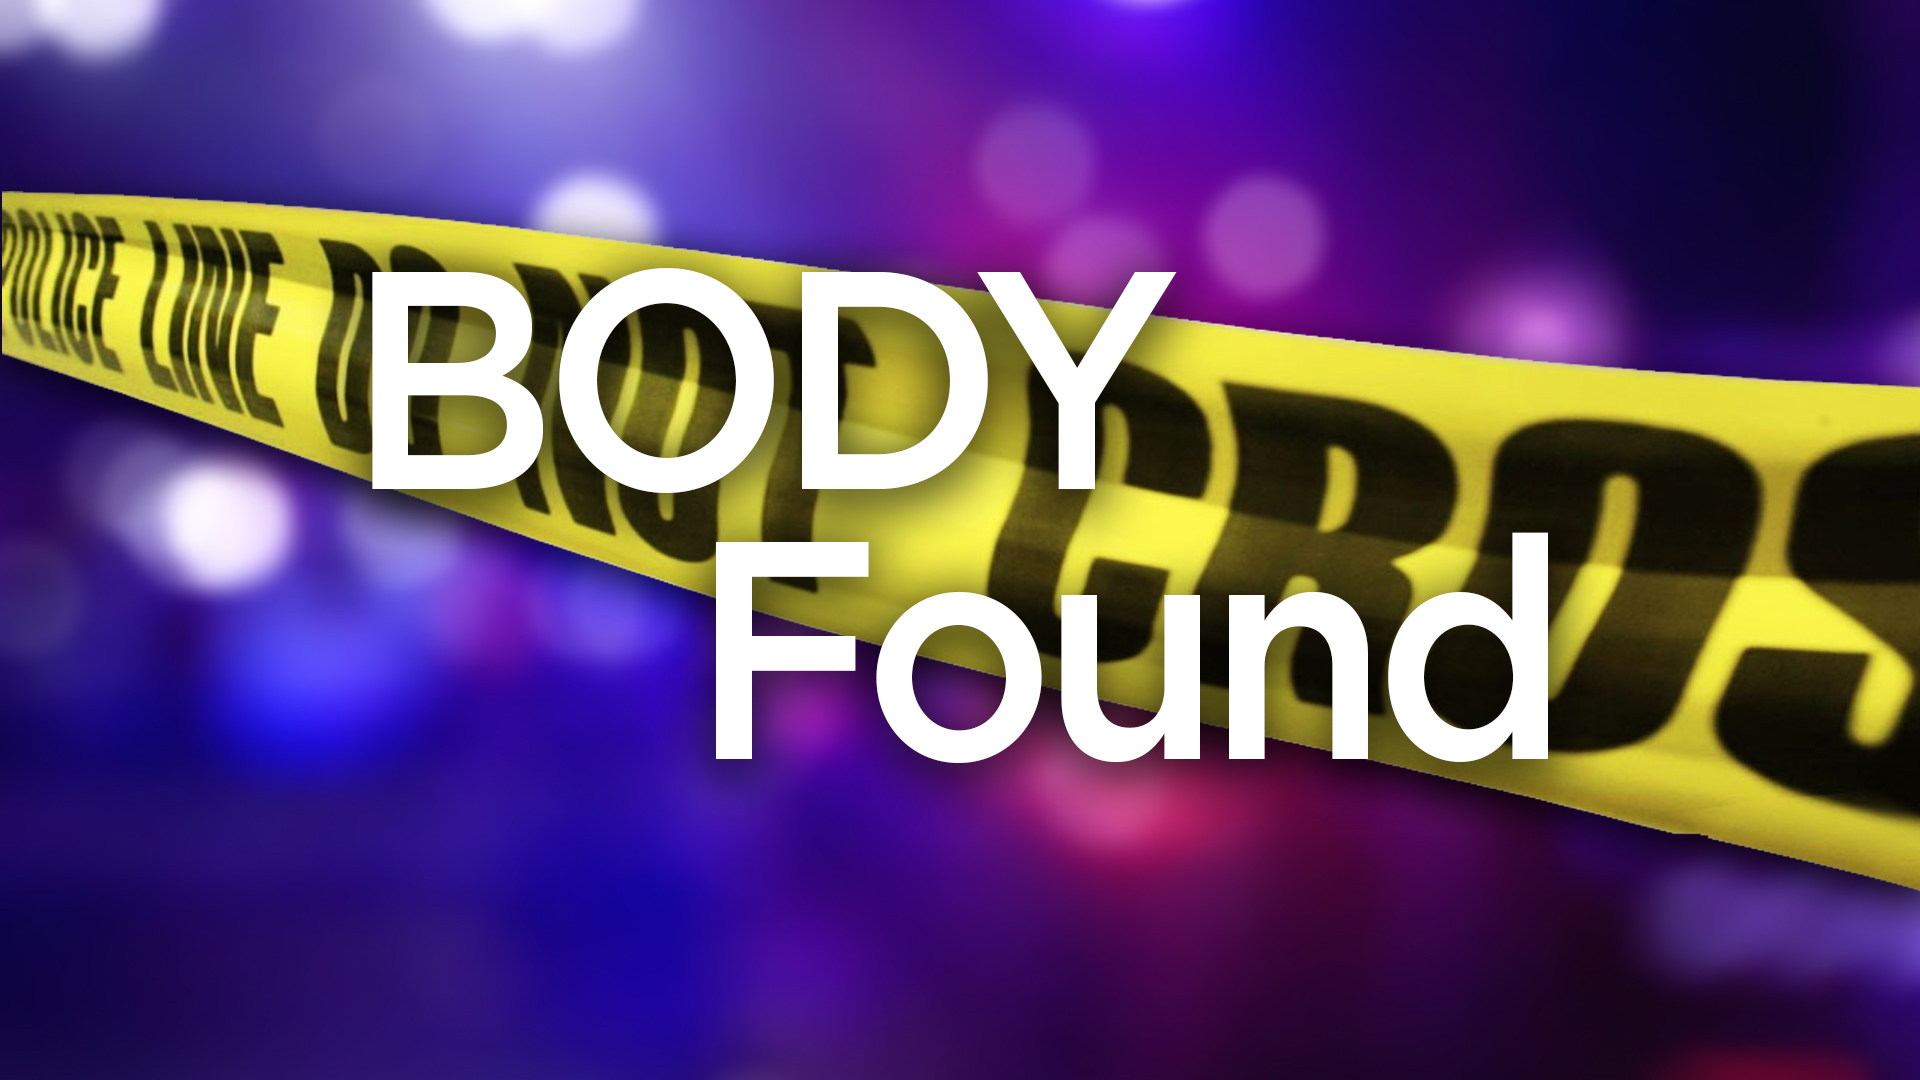 body found_1560866813553.jpg.jpg